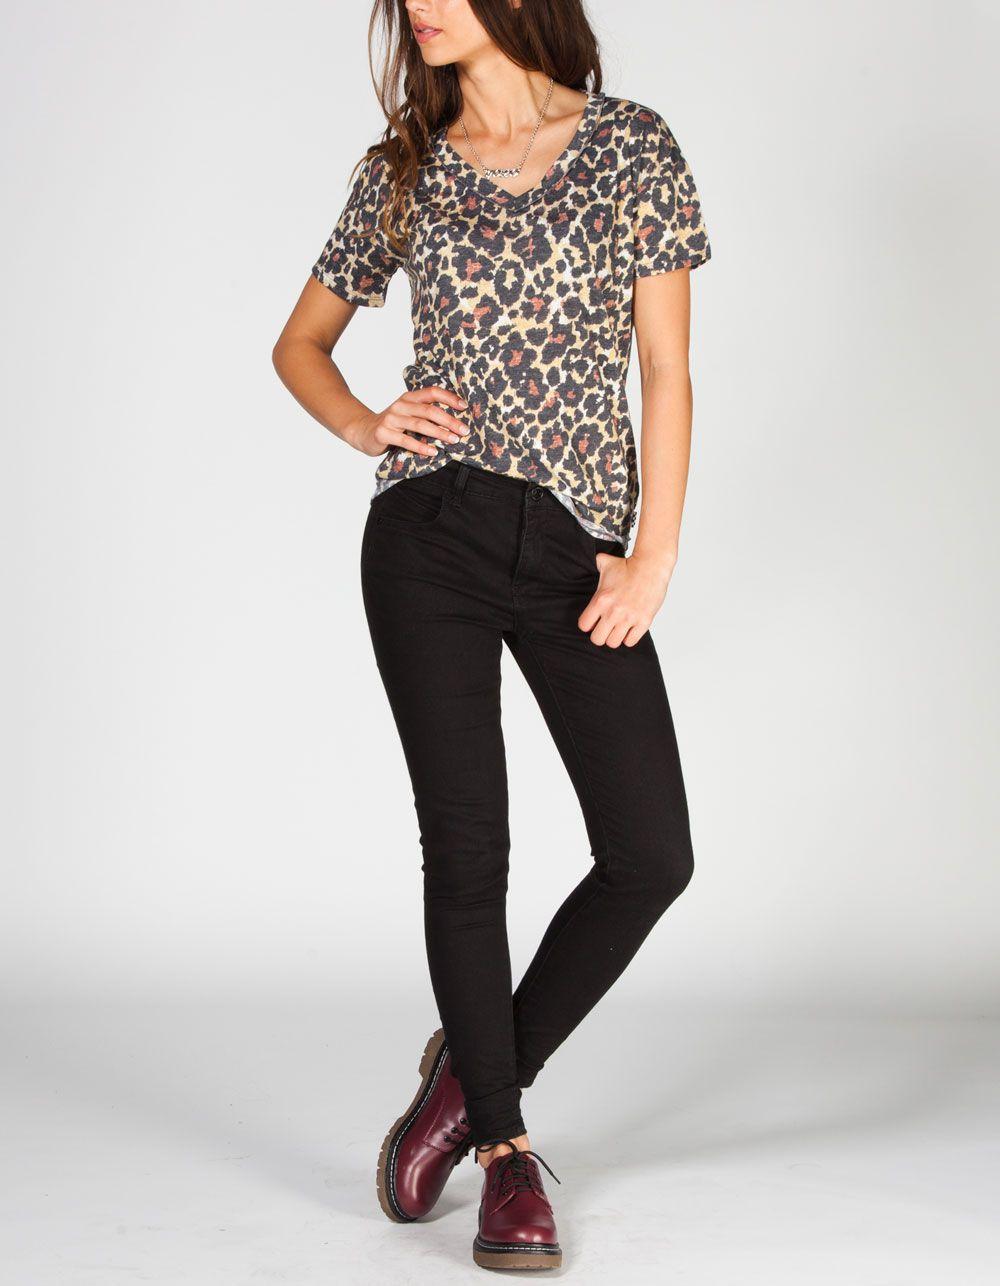 VANS Leopardy Womens Tee 224896435 | Graphic Tees & Tanks | Tillys.com